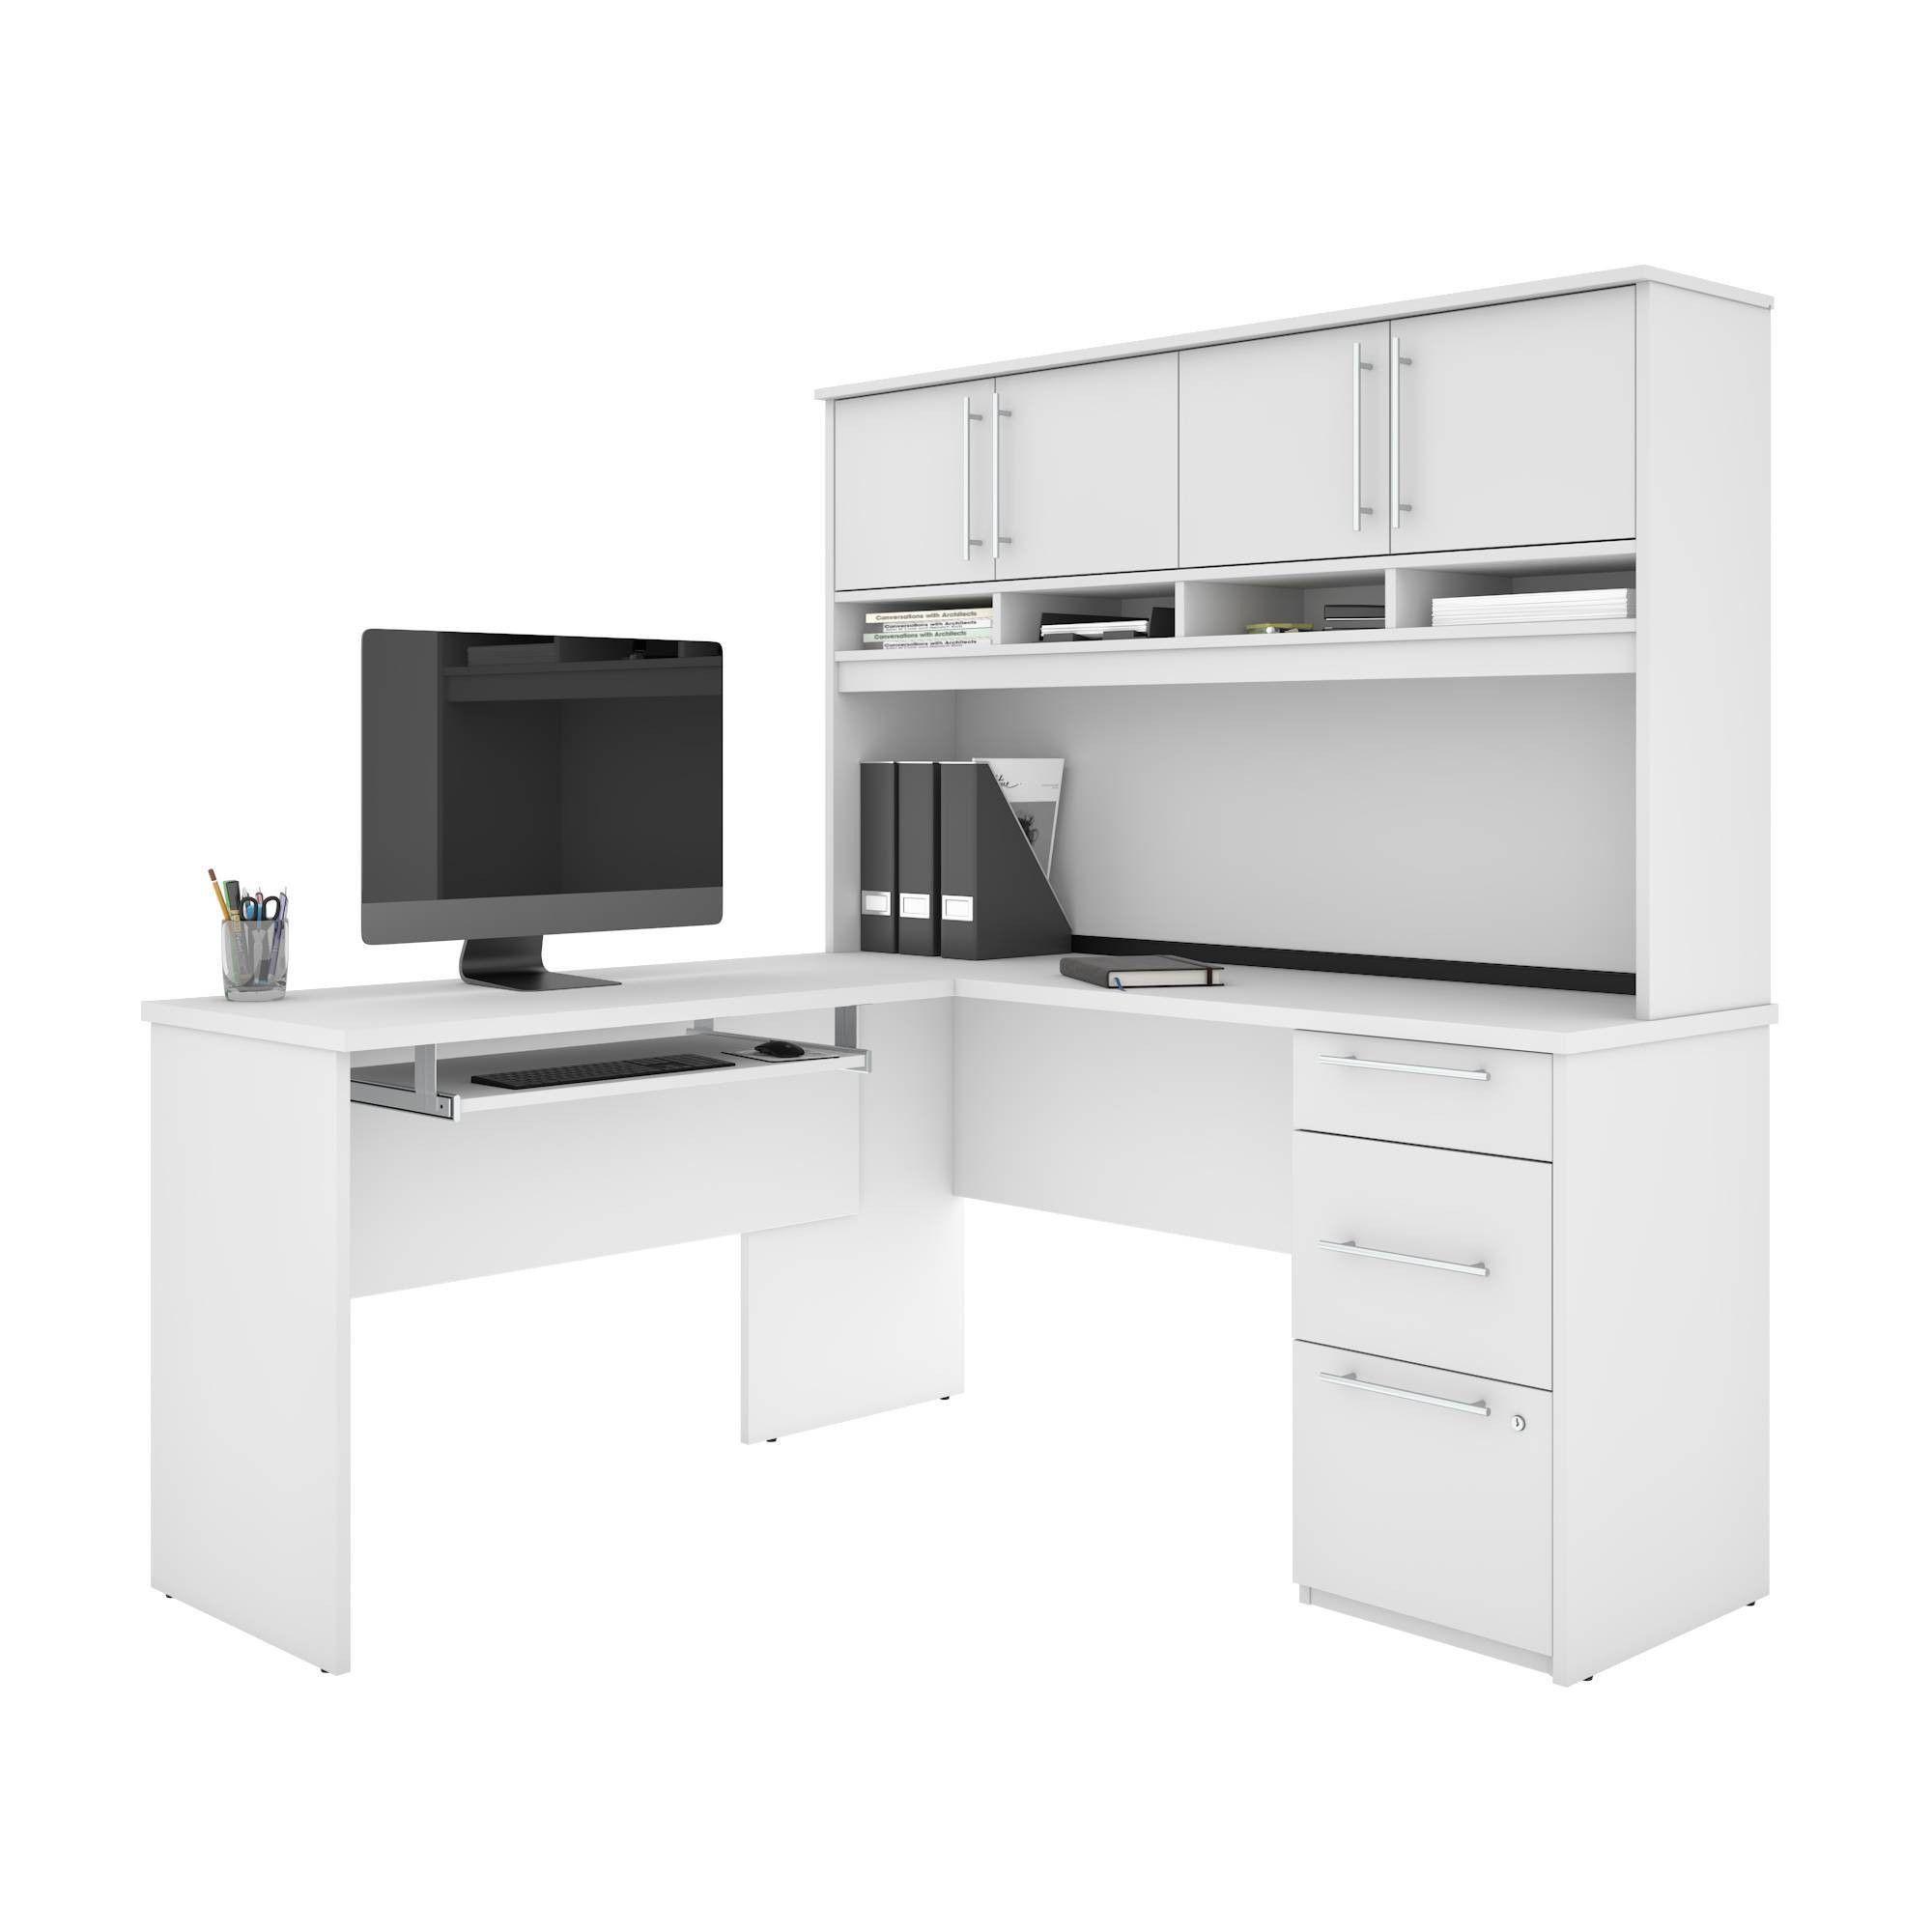 Innova Plus L Shaped Desk White Bestar L Shaped Desk Home Office Furniture White Desks White l shaped desk with hutch